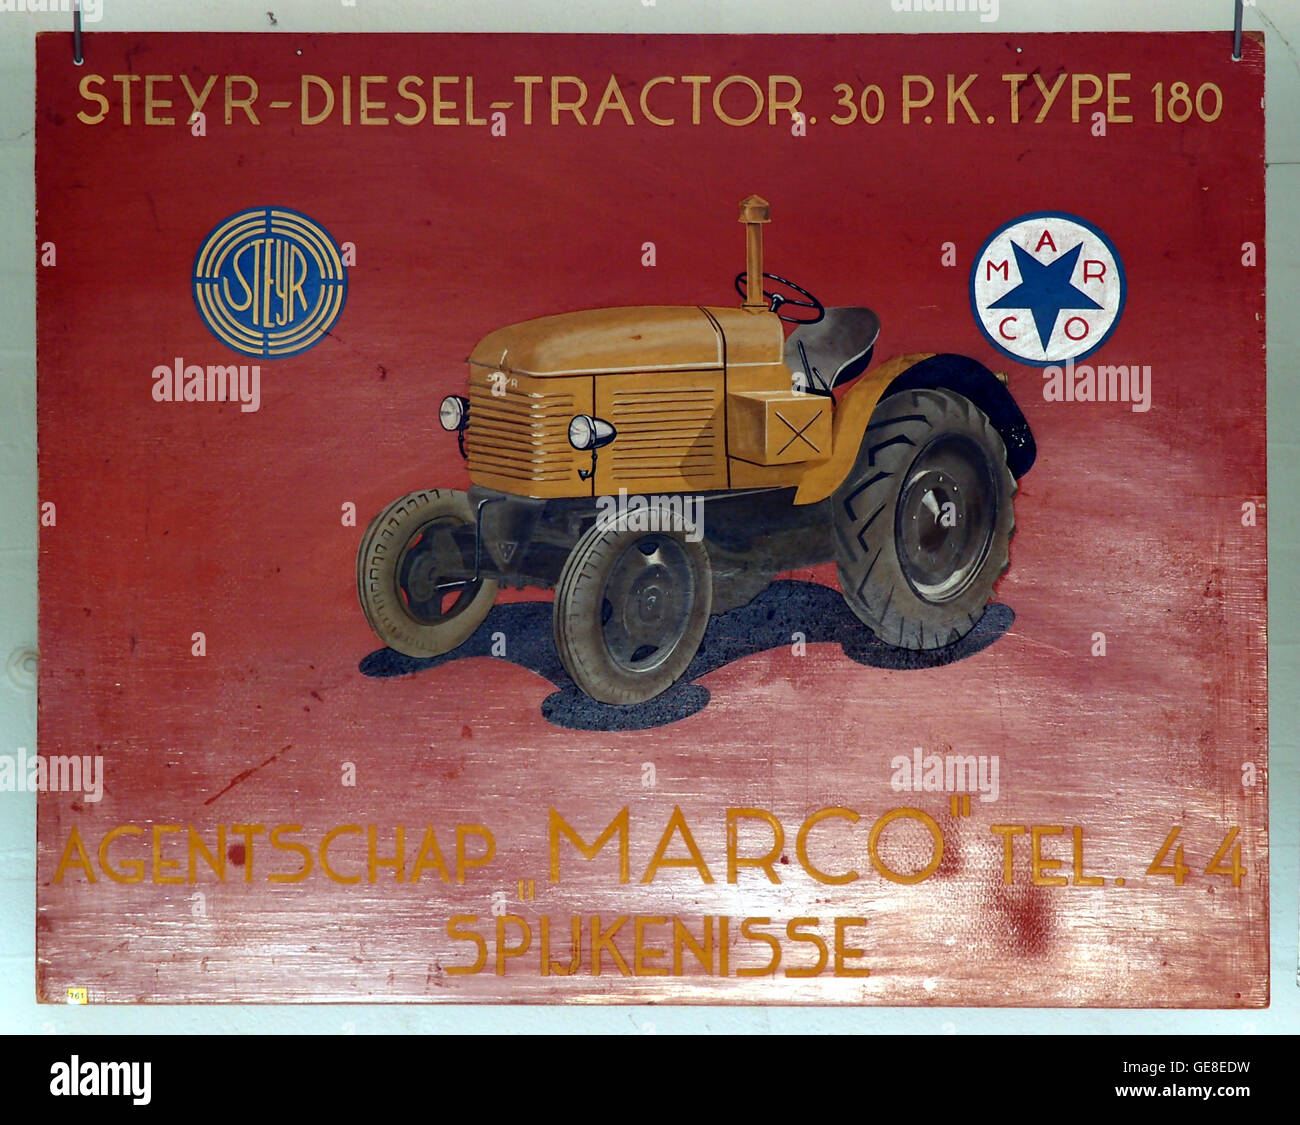 Styer-Diesel-Tractor 30 Pk type 180, oud reclamebord - Stock Image